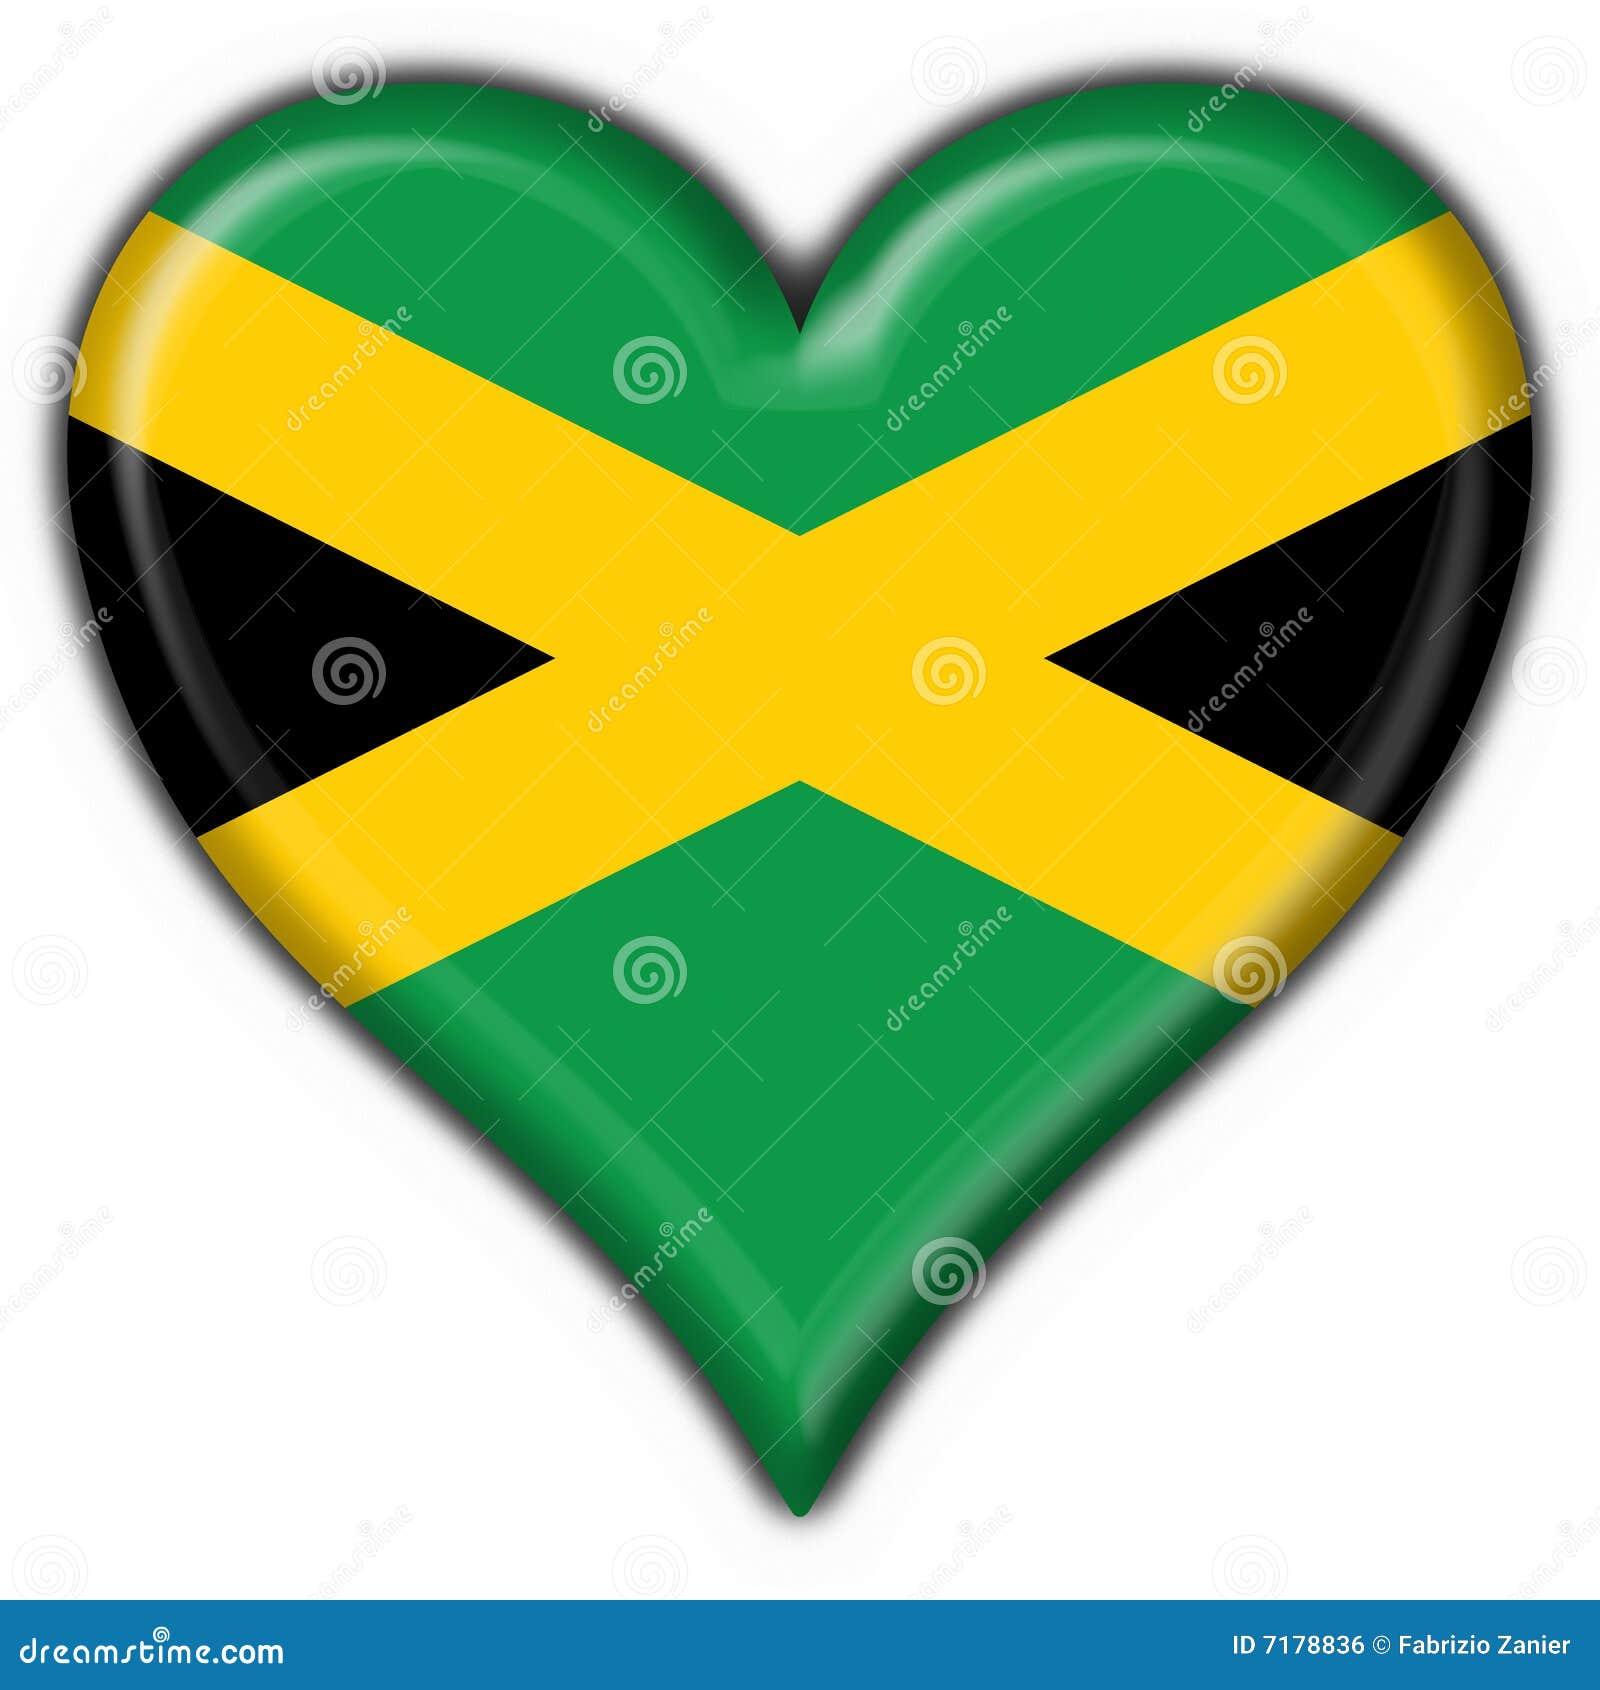 Jamaica button flag heart shape